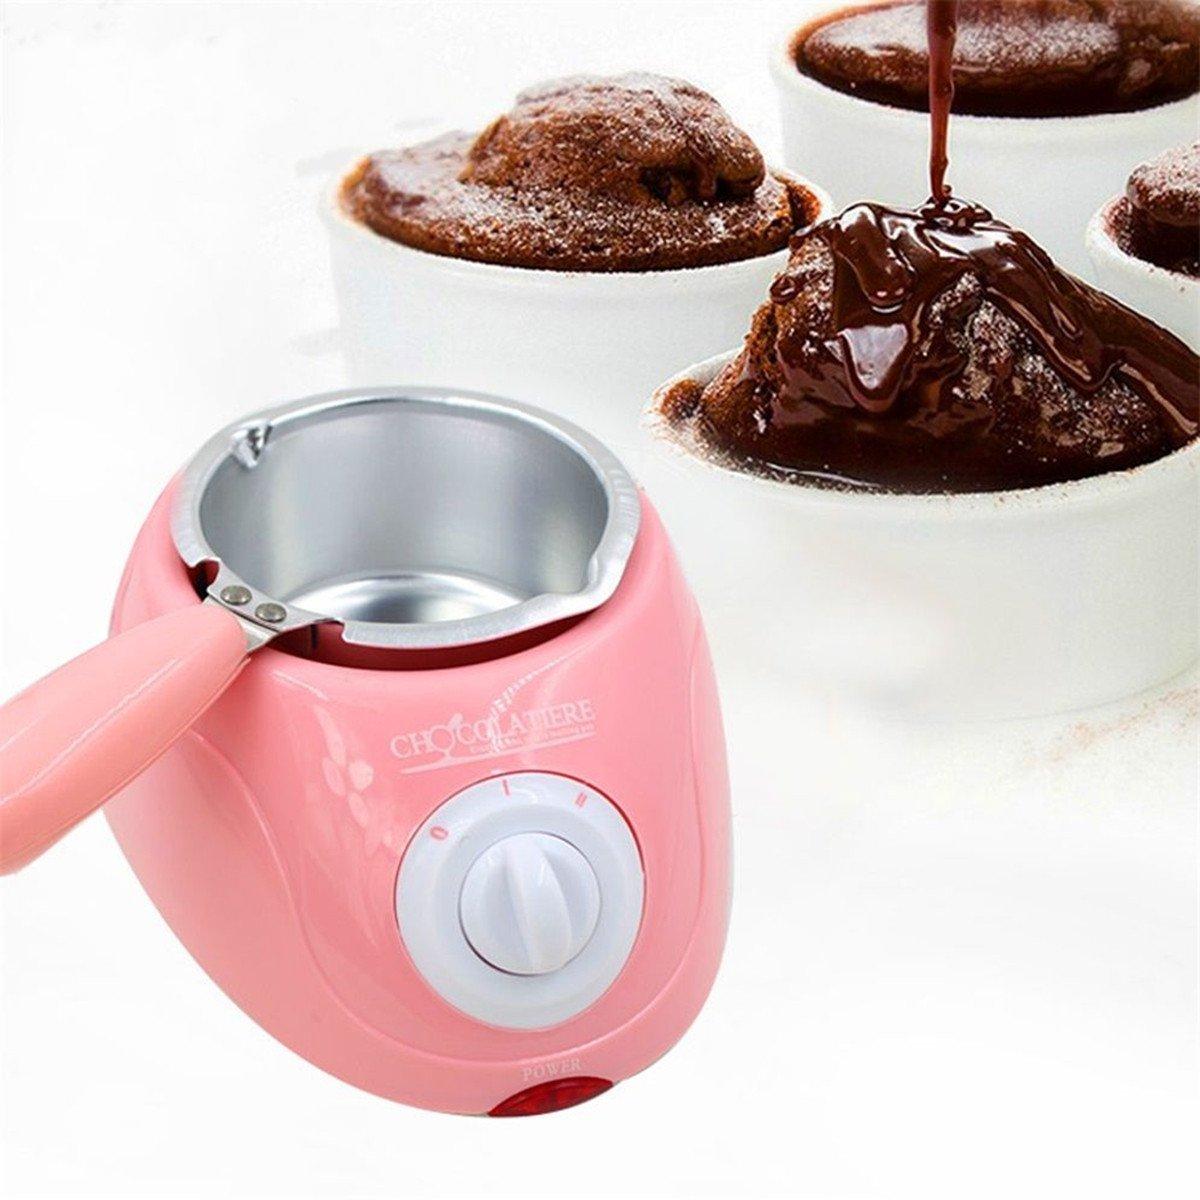 LYEJM Pink Chocolate Melting Pot Electric Fondue Melter Machine Set DIY Kitchen Tool LYEJM by LYEJM (Image #2)